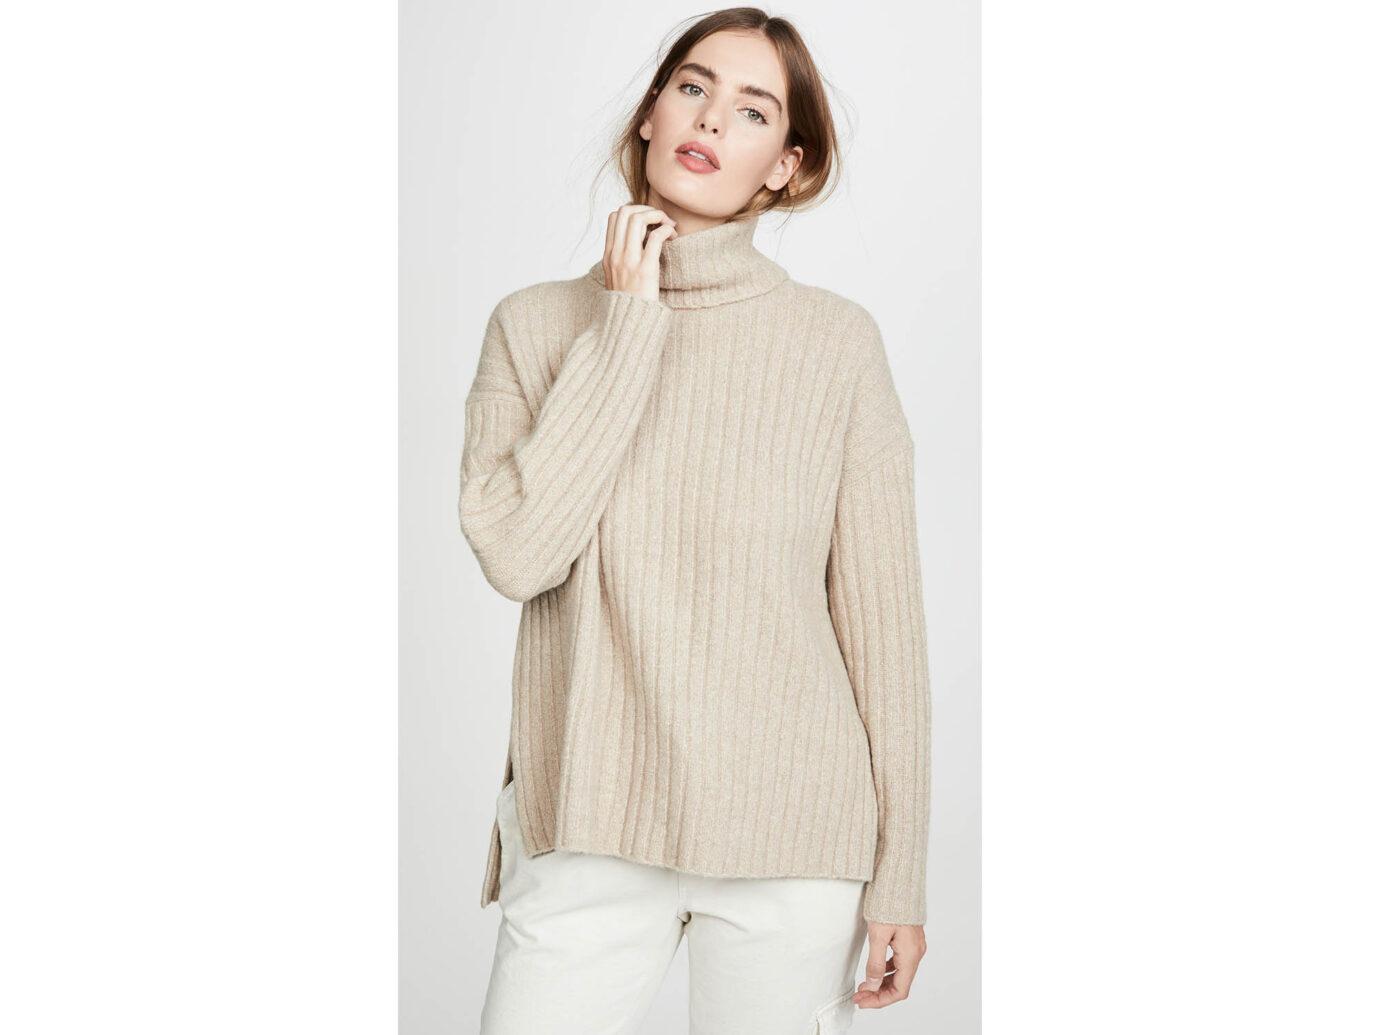 Nili Lotan Nashira Cashmere Sweater